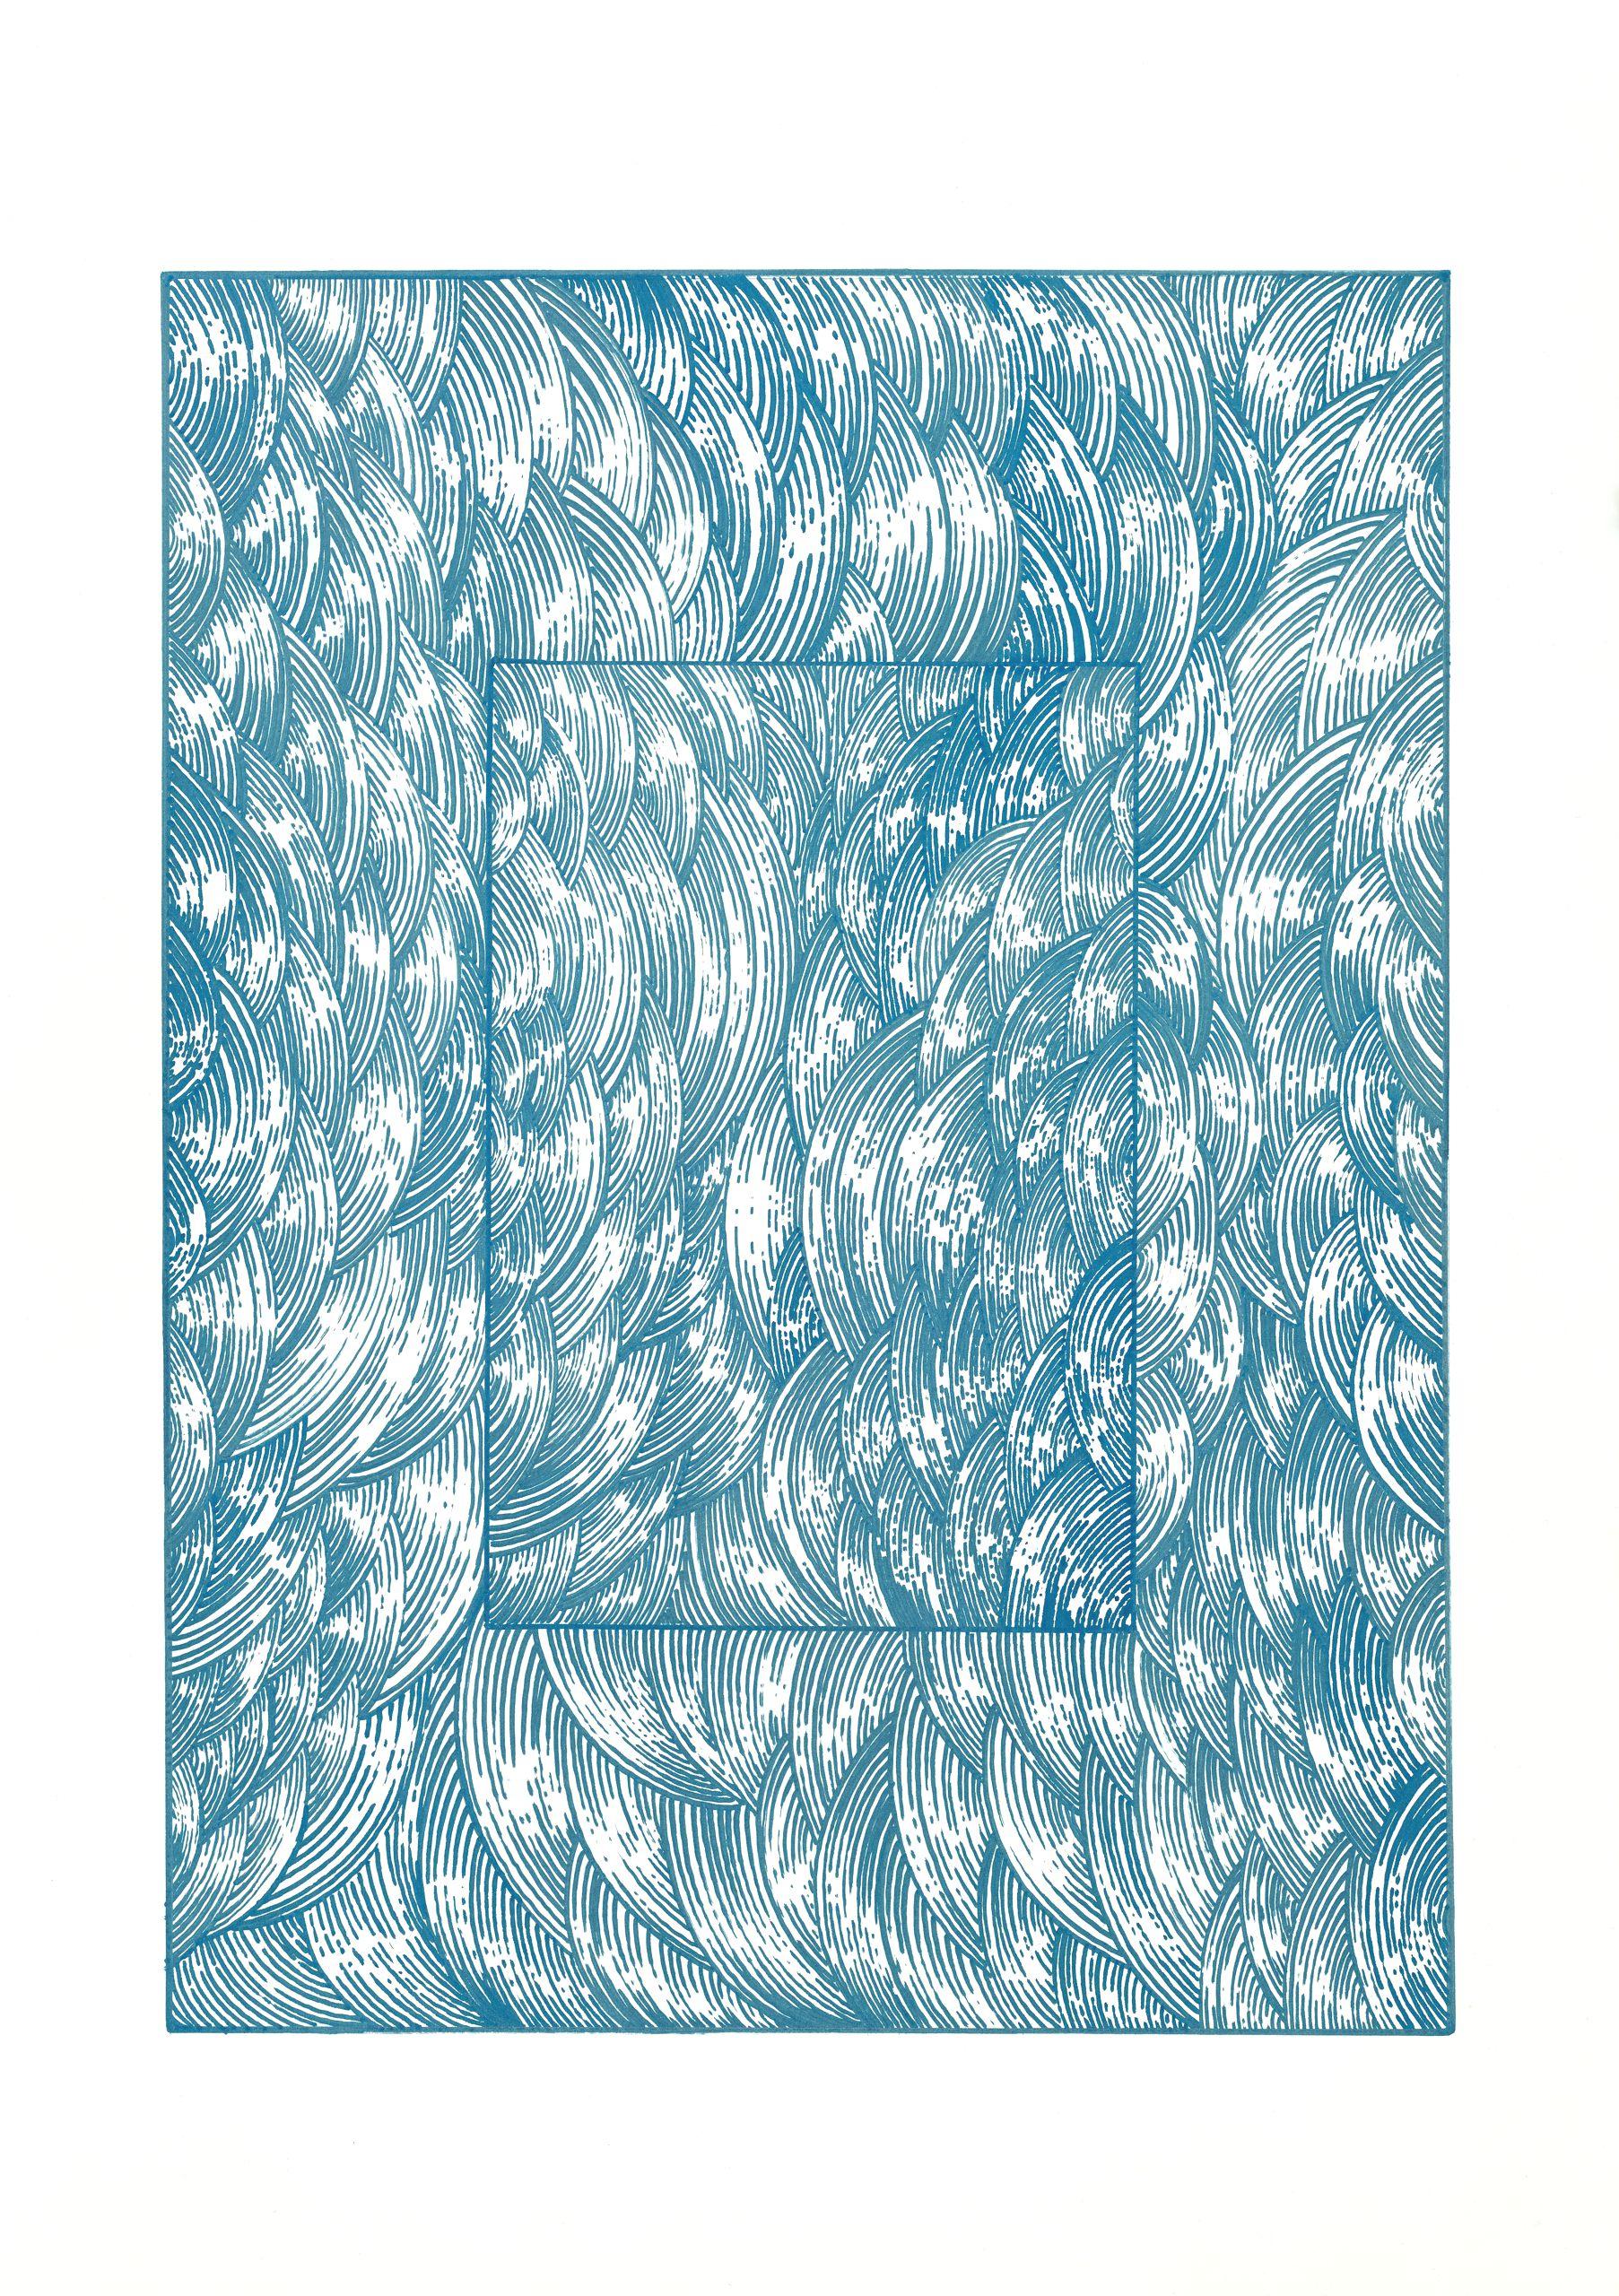 BK P157 | untitled | acrylic on paper | 2013